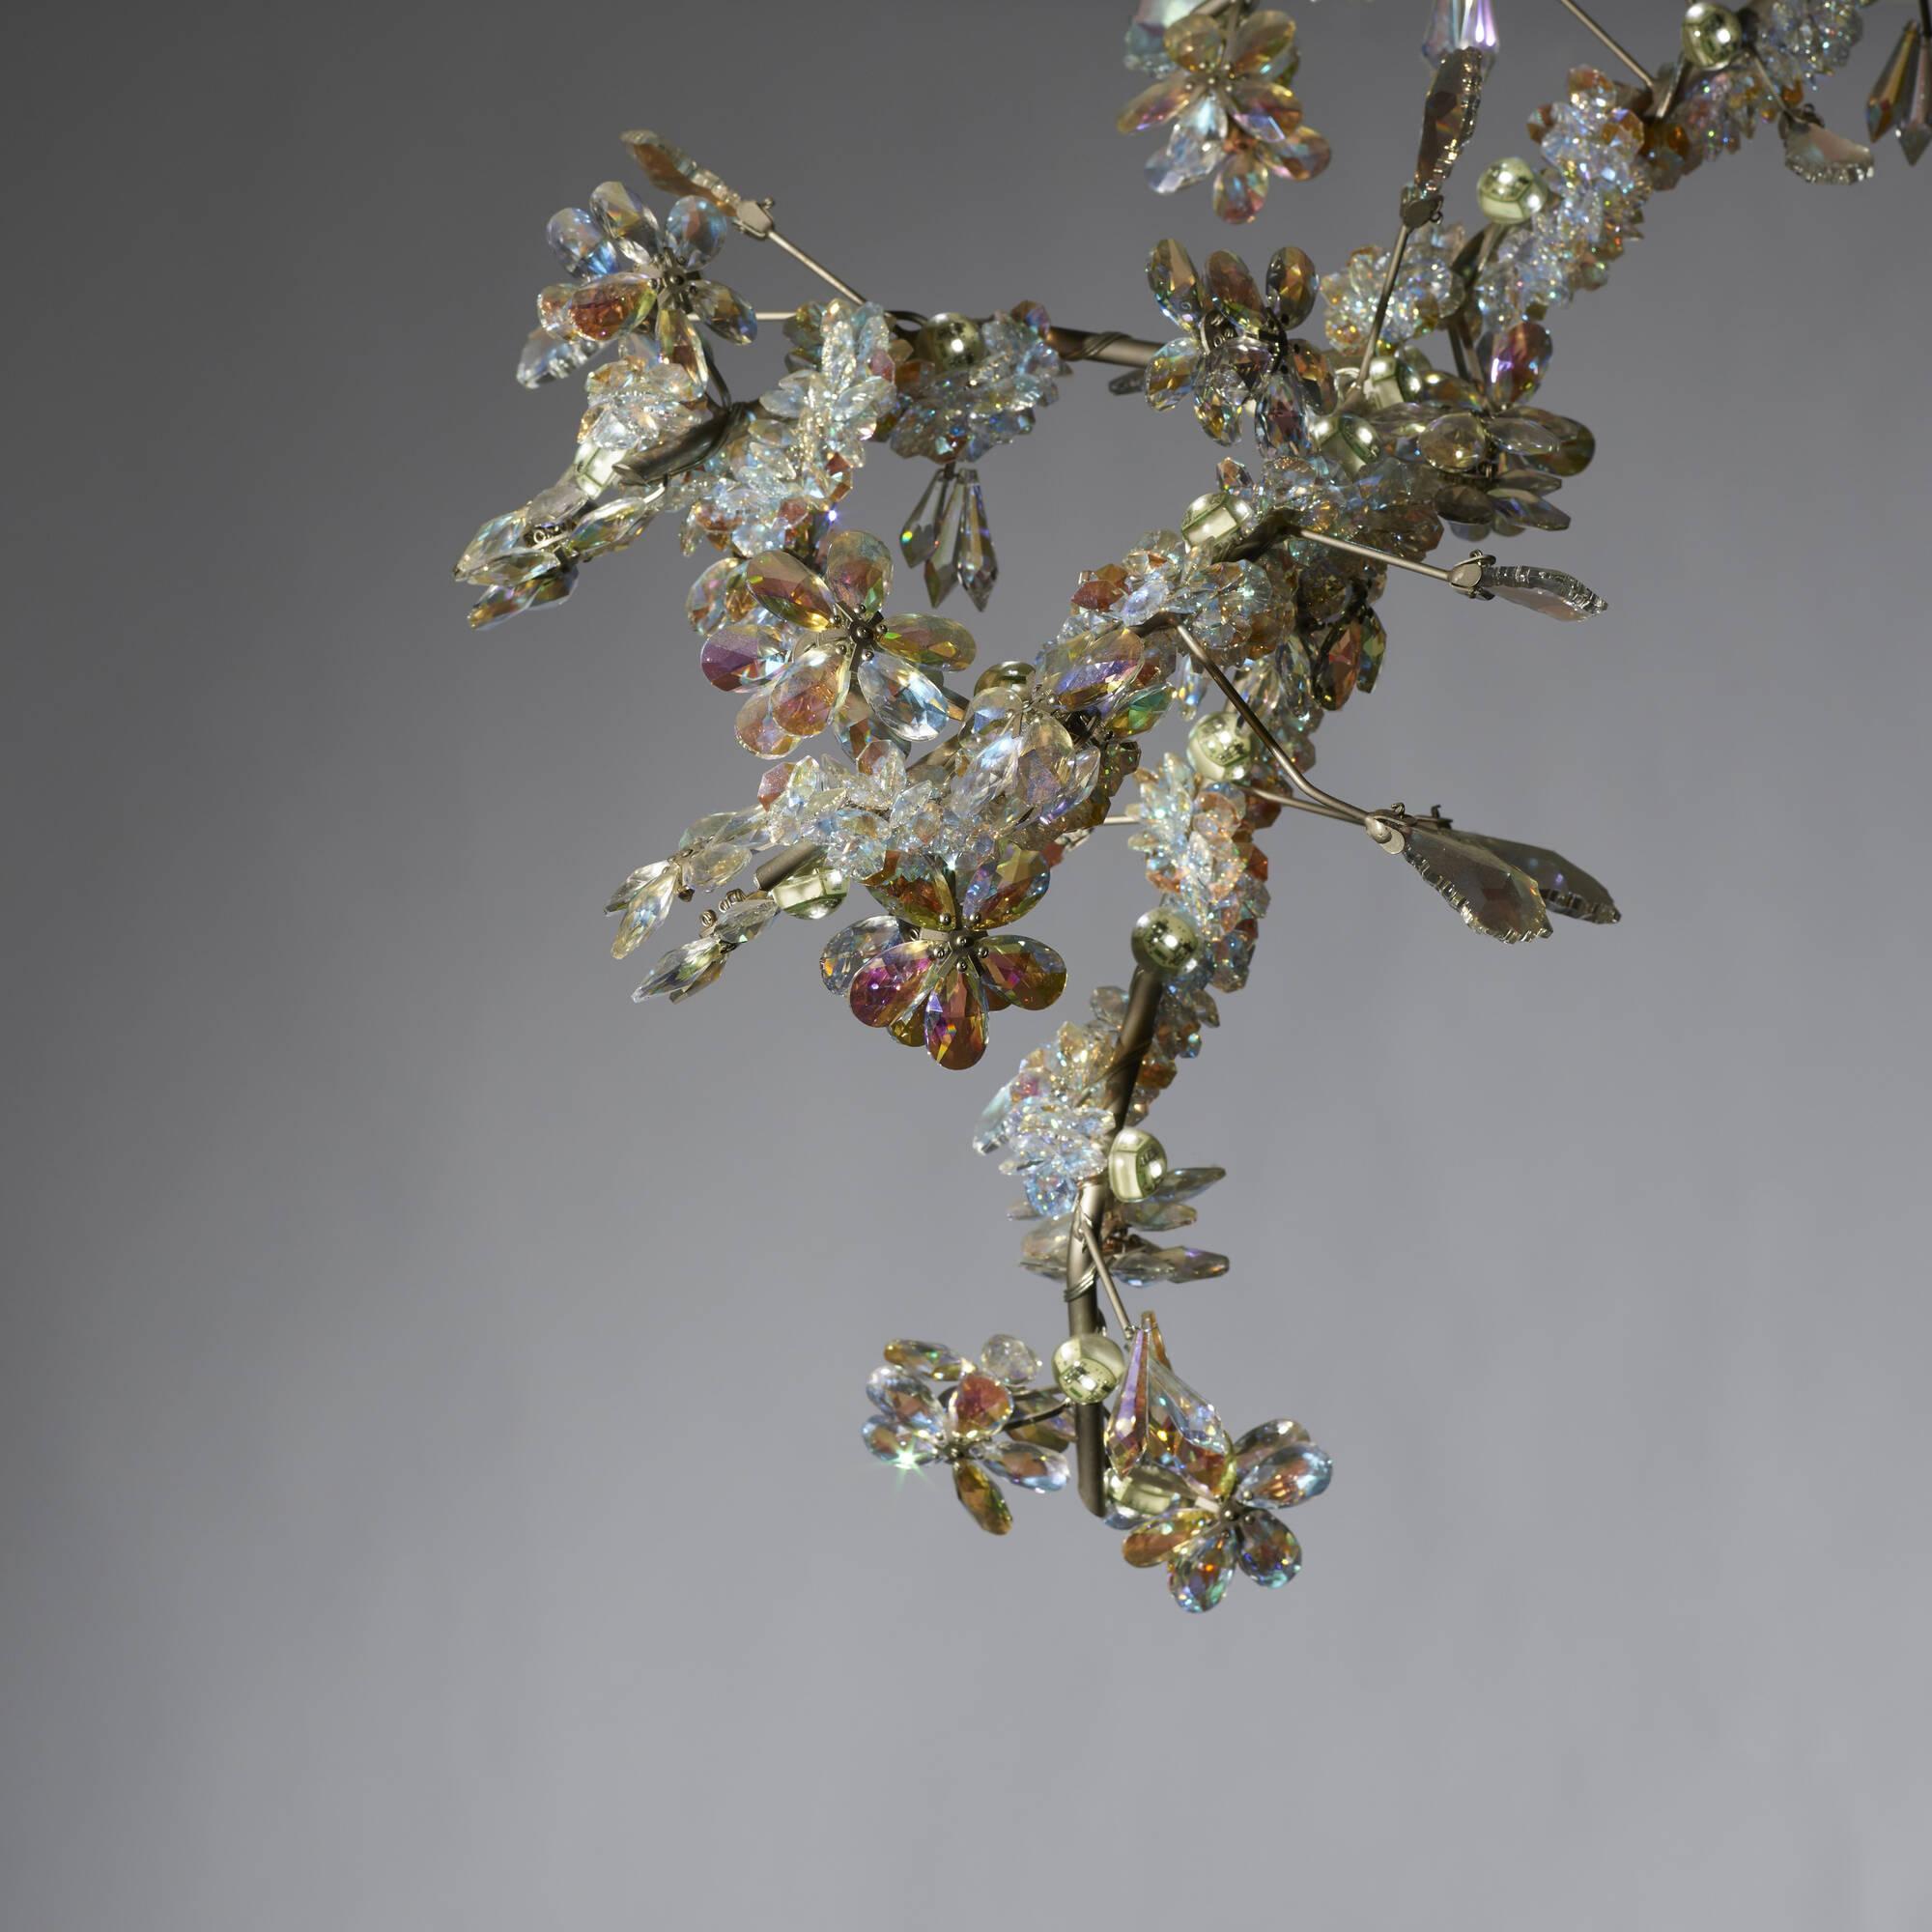 453 Tord Boontje Blossom Chandelier 3 Of